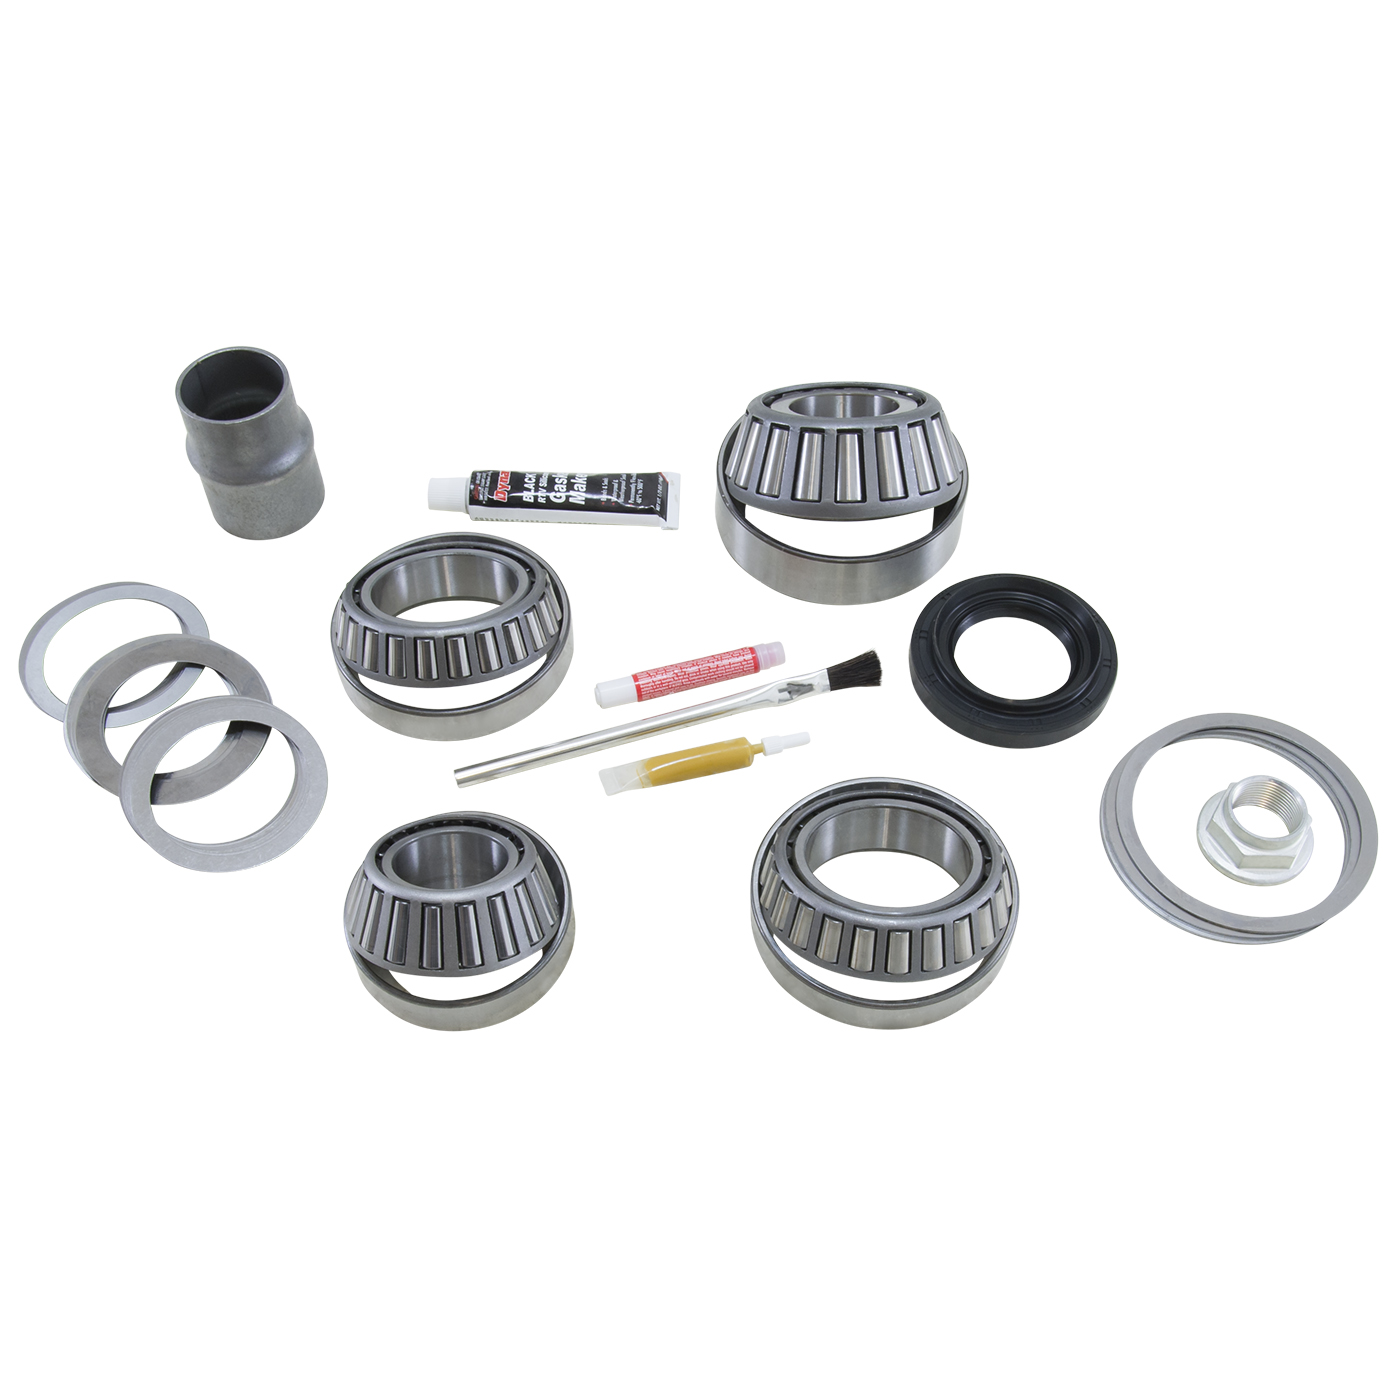 USA Standard Gear ZK TV6-B Master Differential Rebuild Kits